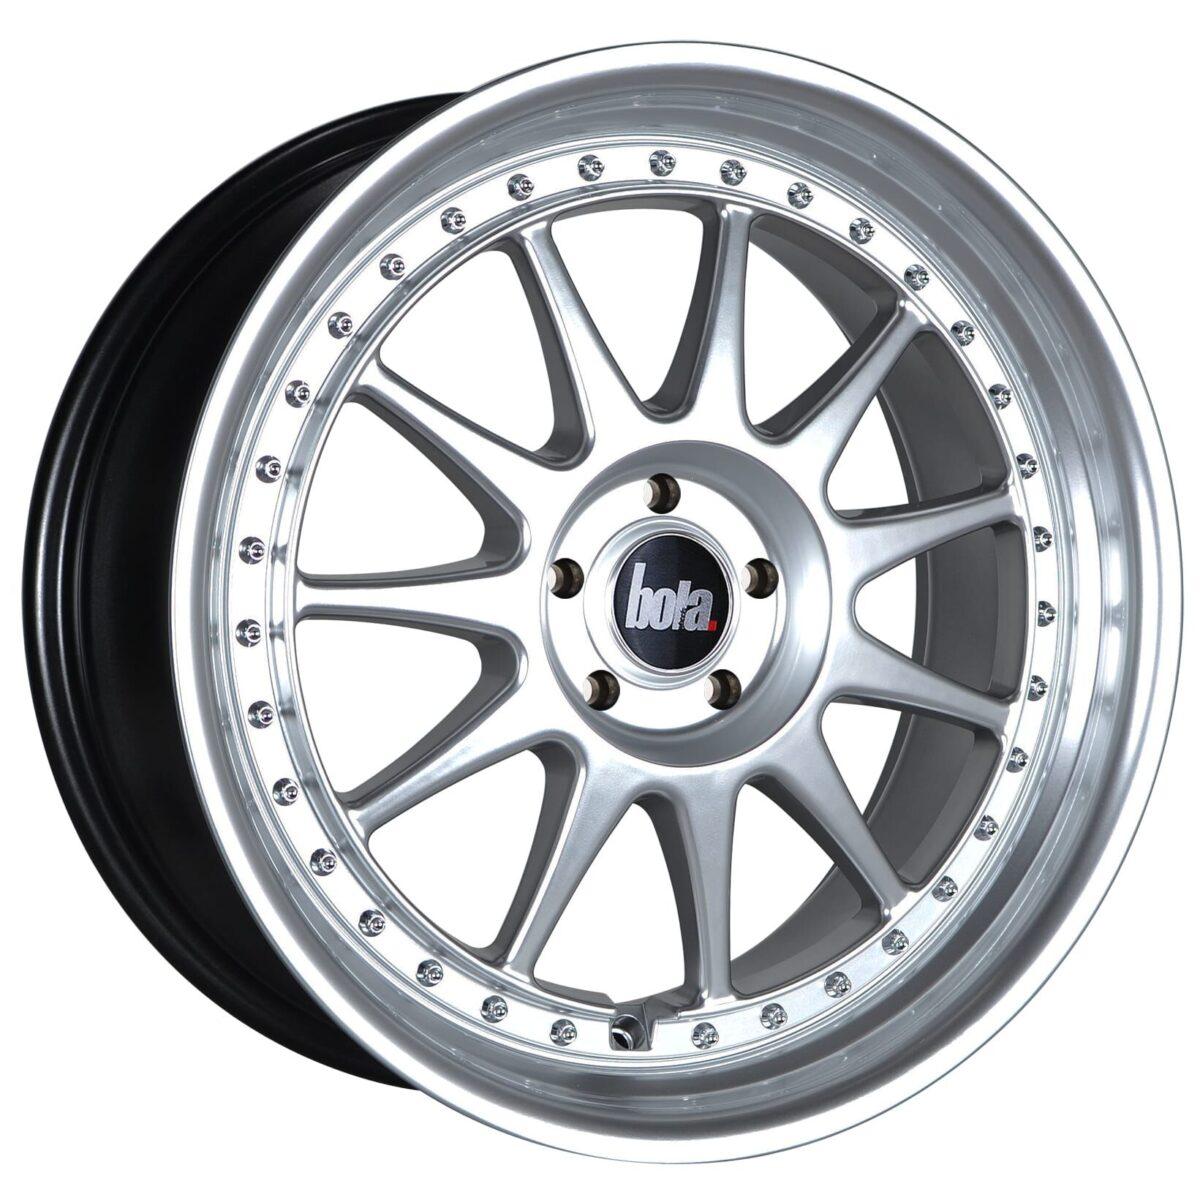 "18"" BOLA B4 Wheels - Hyper Silver with Silver Rivets - VW / Audi / Mercedes - 5x112"